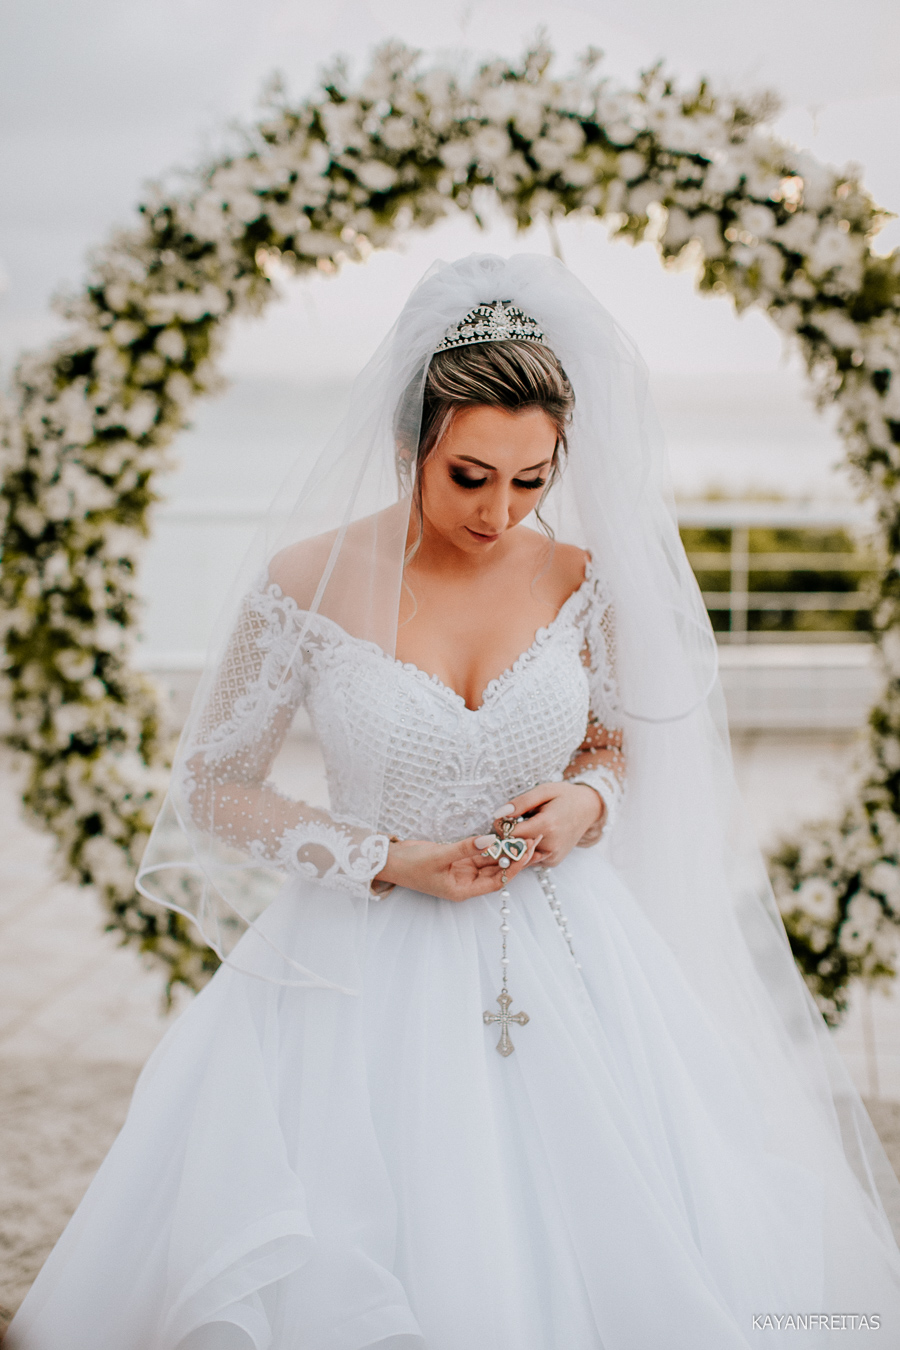 casamento-mariadomar-floripa-0116 Casamento Jéssica e Felipe - Maria do Mar Hotel